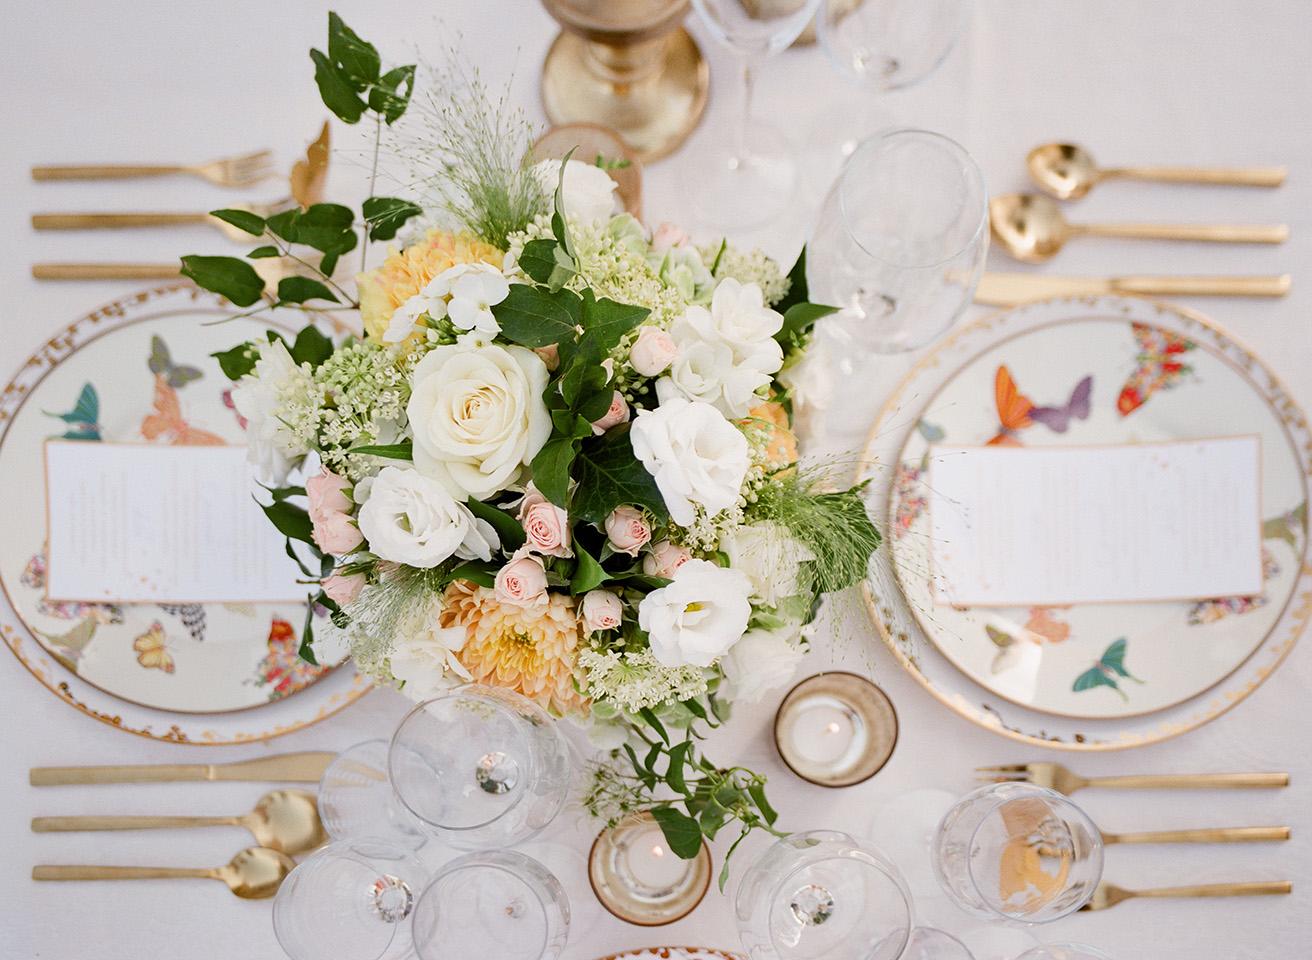 Flower Details - Castello Di Casole, Italy - Summer Wedding - Julian Leaver Events